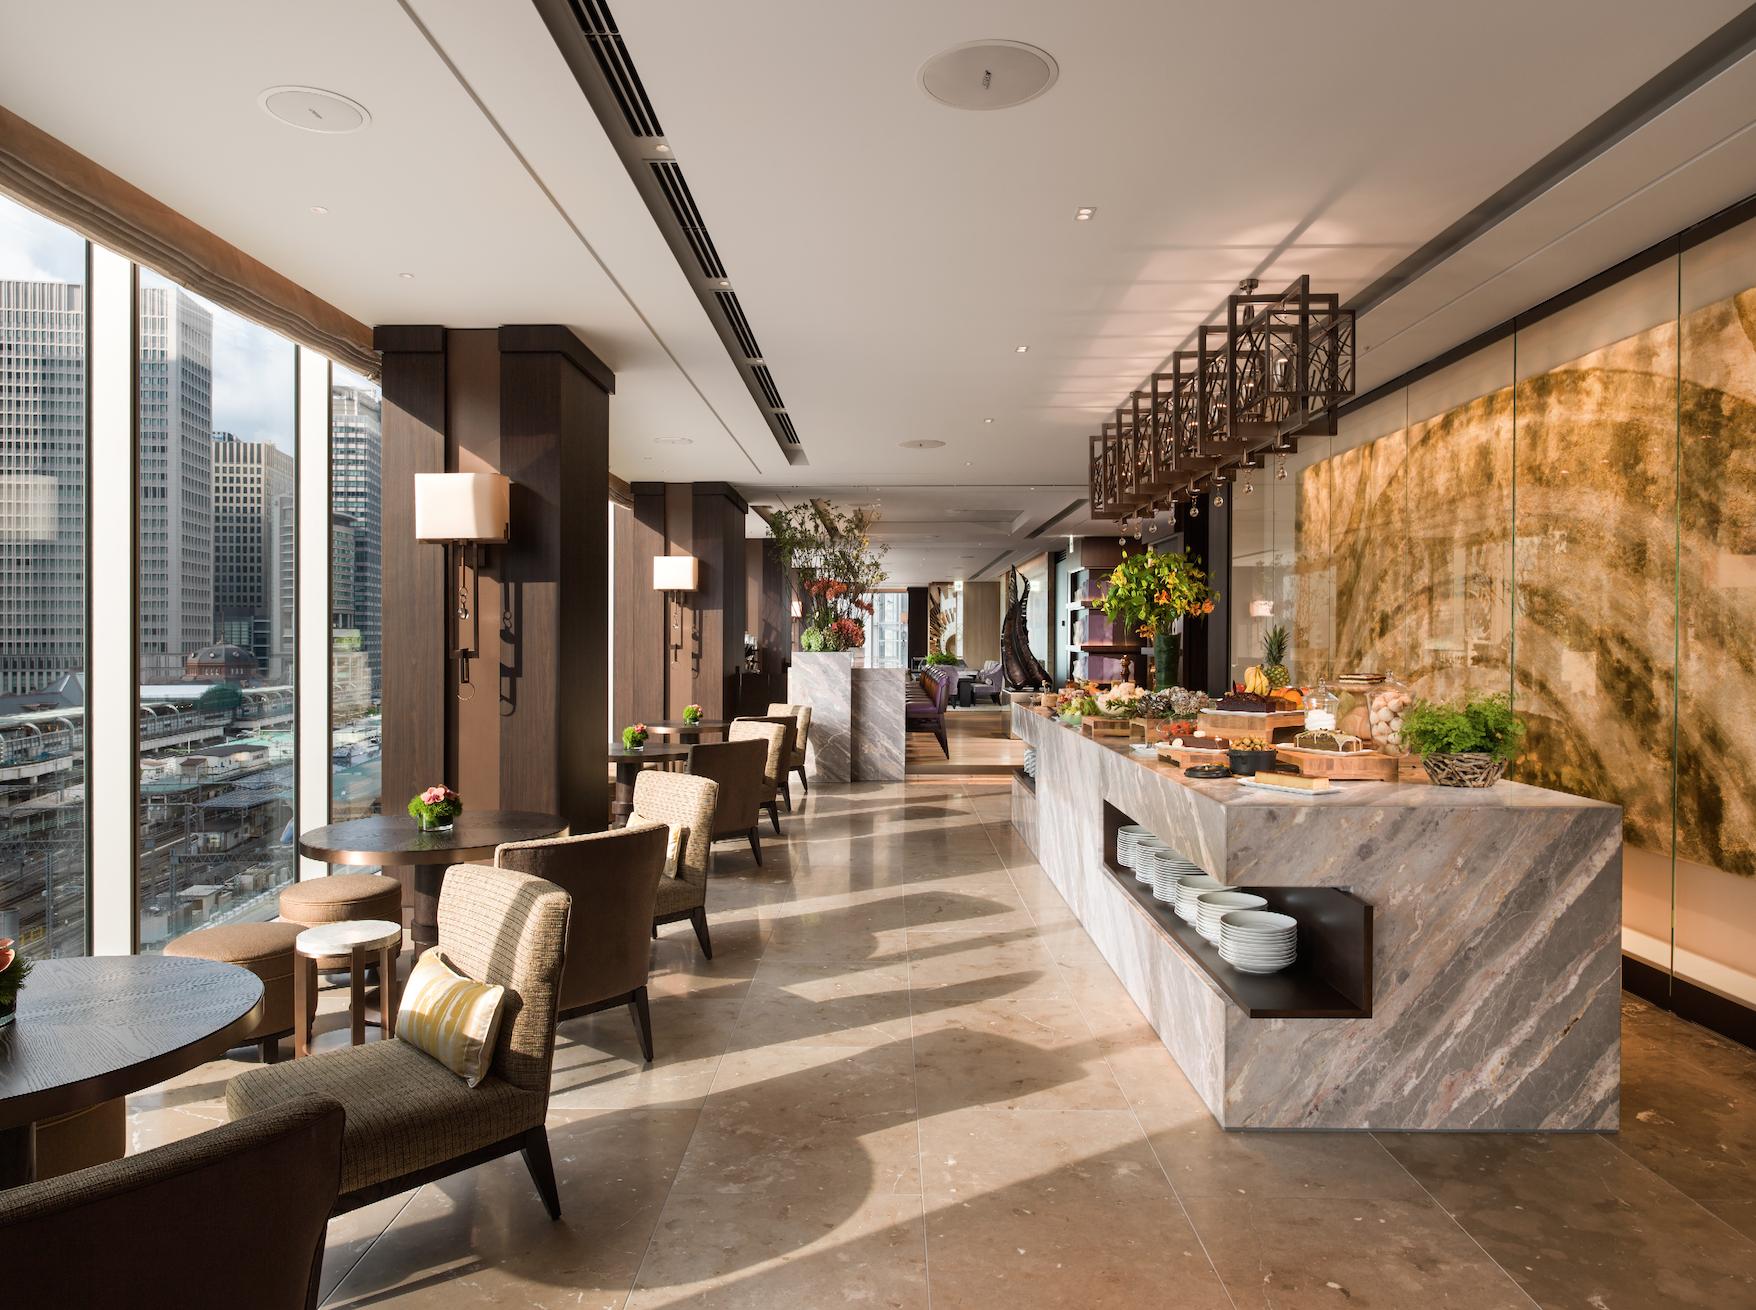 Motif Restaurant & Bar - Tokyo